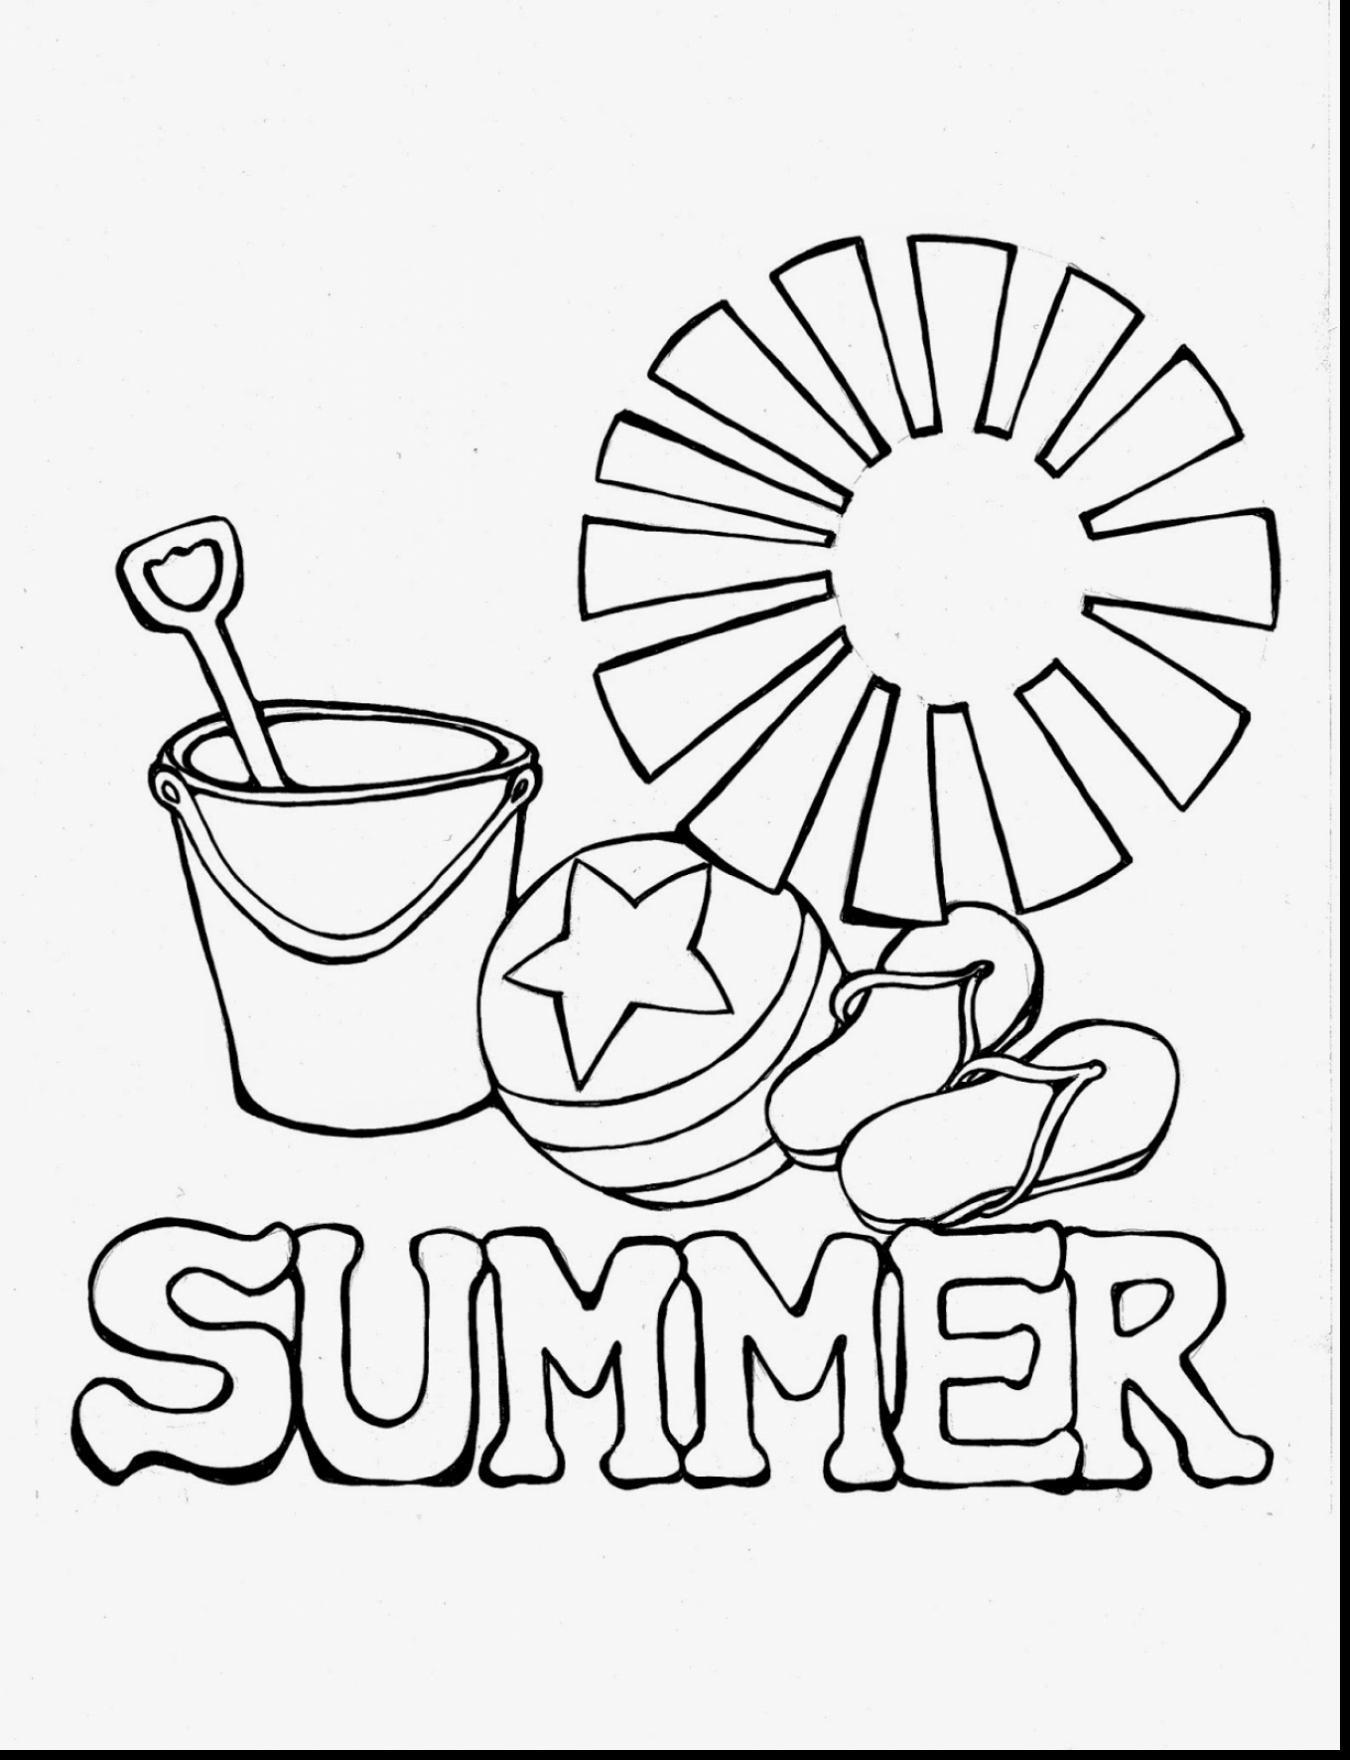 Free Printable Summer Coloring Pages - Saglik - Free Printable Summer Coloring Pages